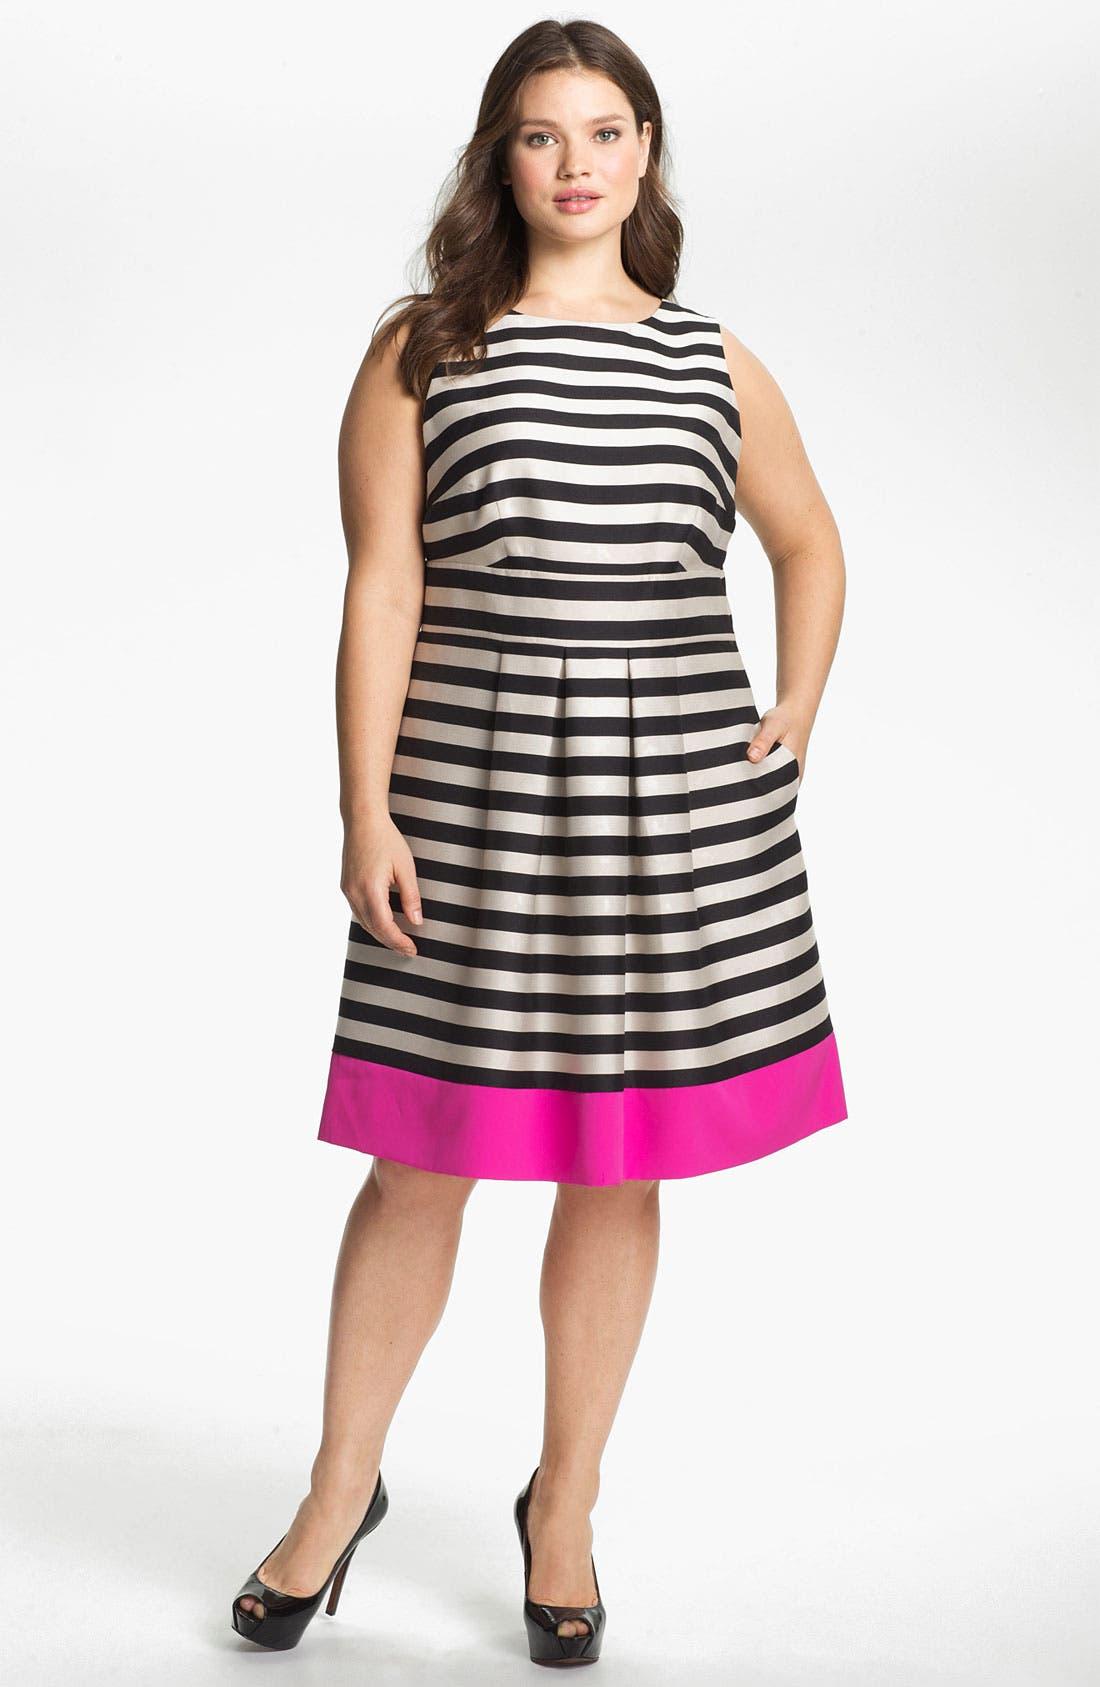 Alternate Image 1 Selected - Eliza J Stripe Fit & Flare Dress (Plus Size)